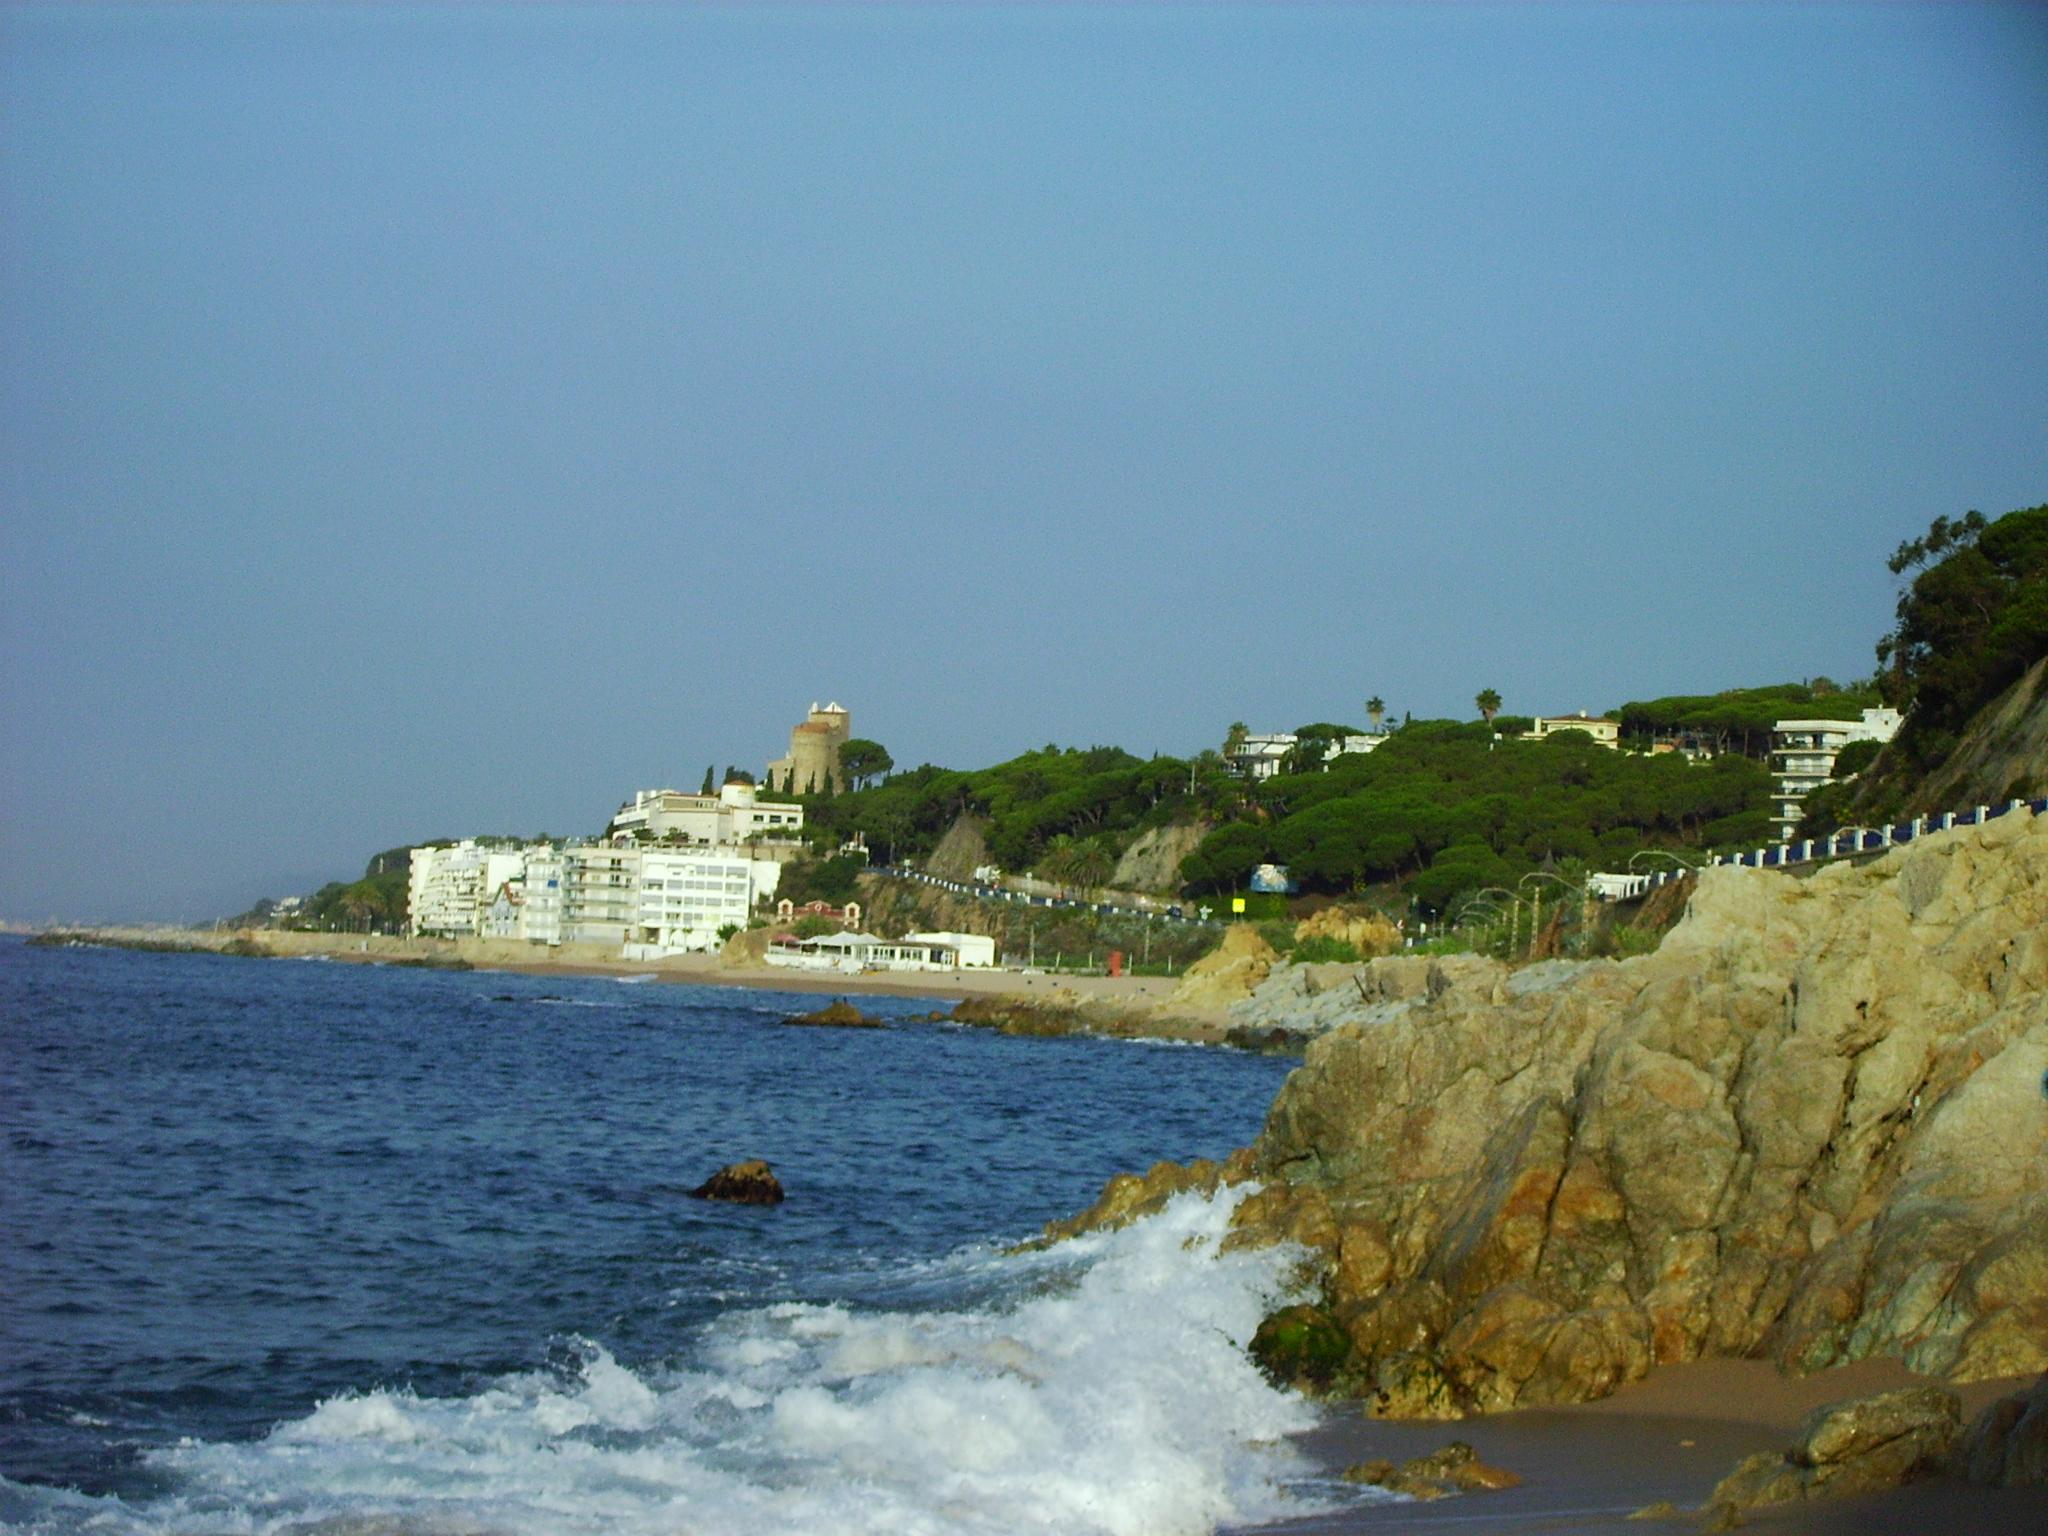 Playa El Morer